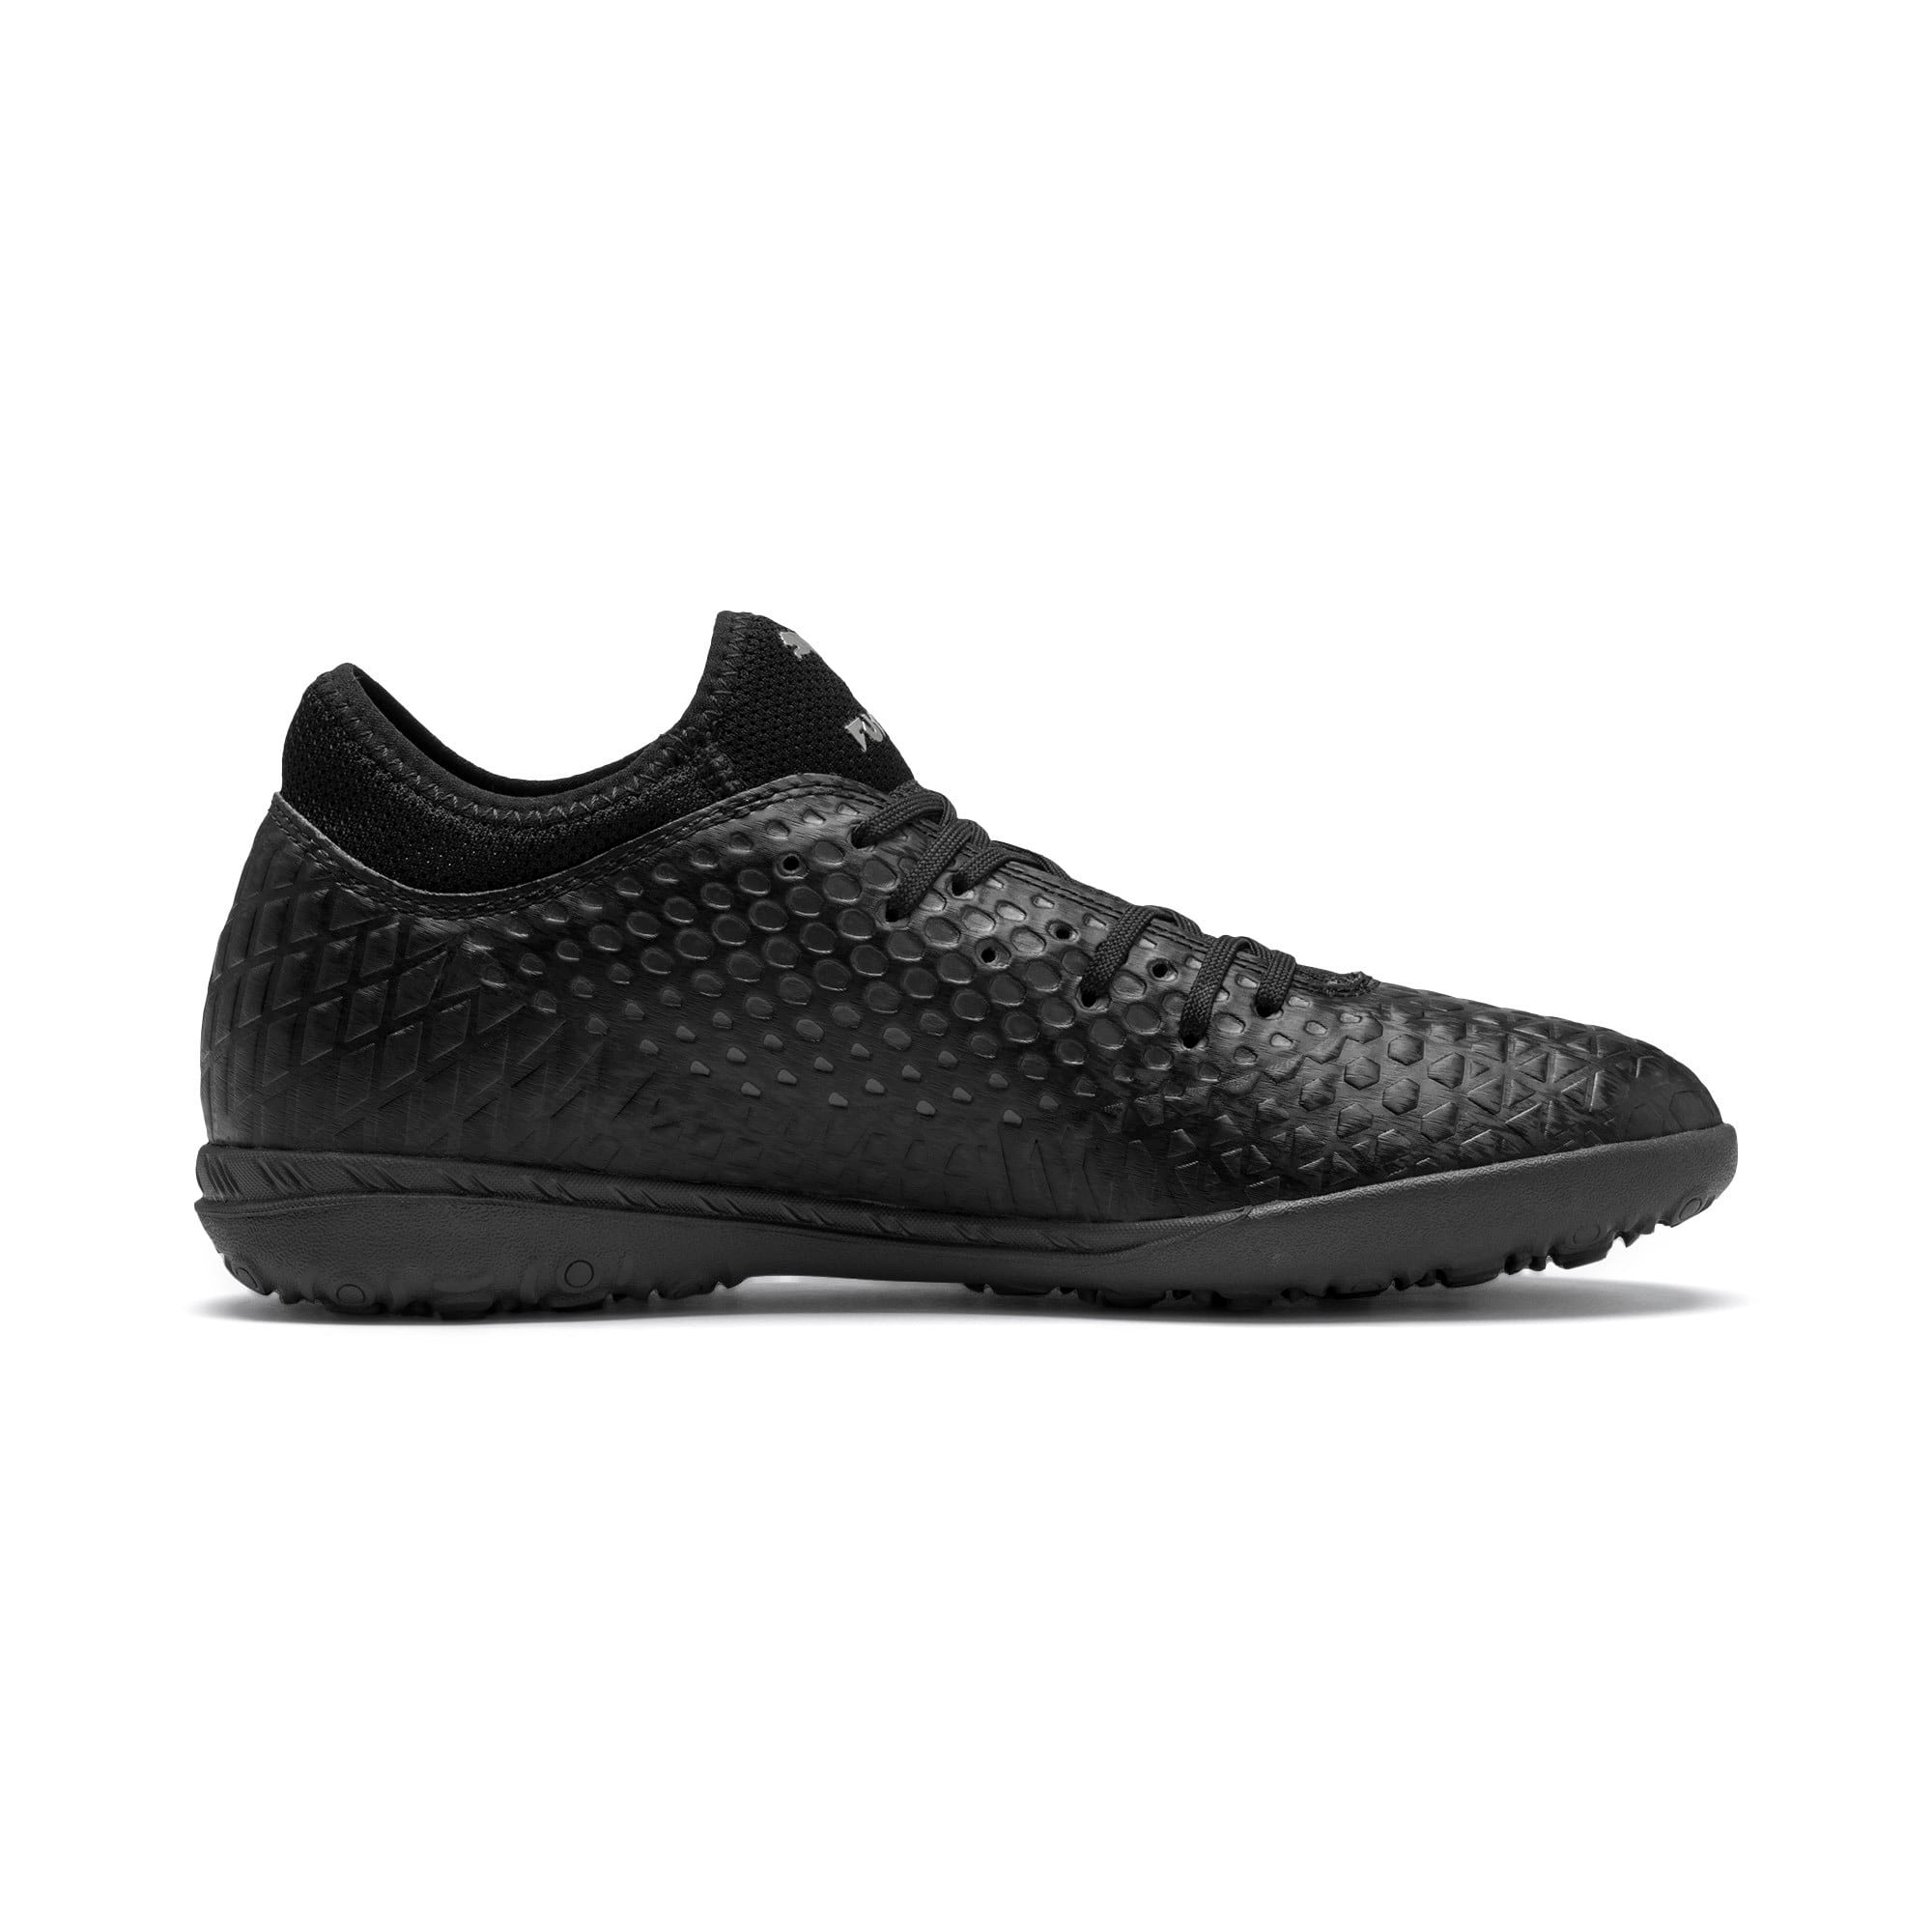 Thumbnail 6 of FUTURE 4.4 TT Men's Soccer Shoes, Black-Black-Puma Aged Silver, medium